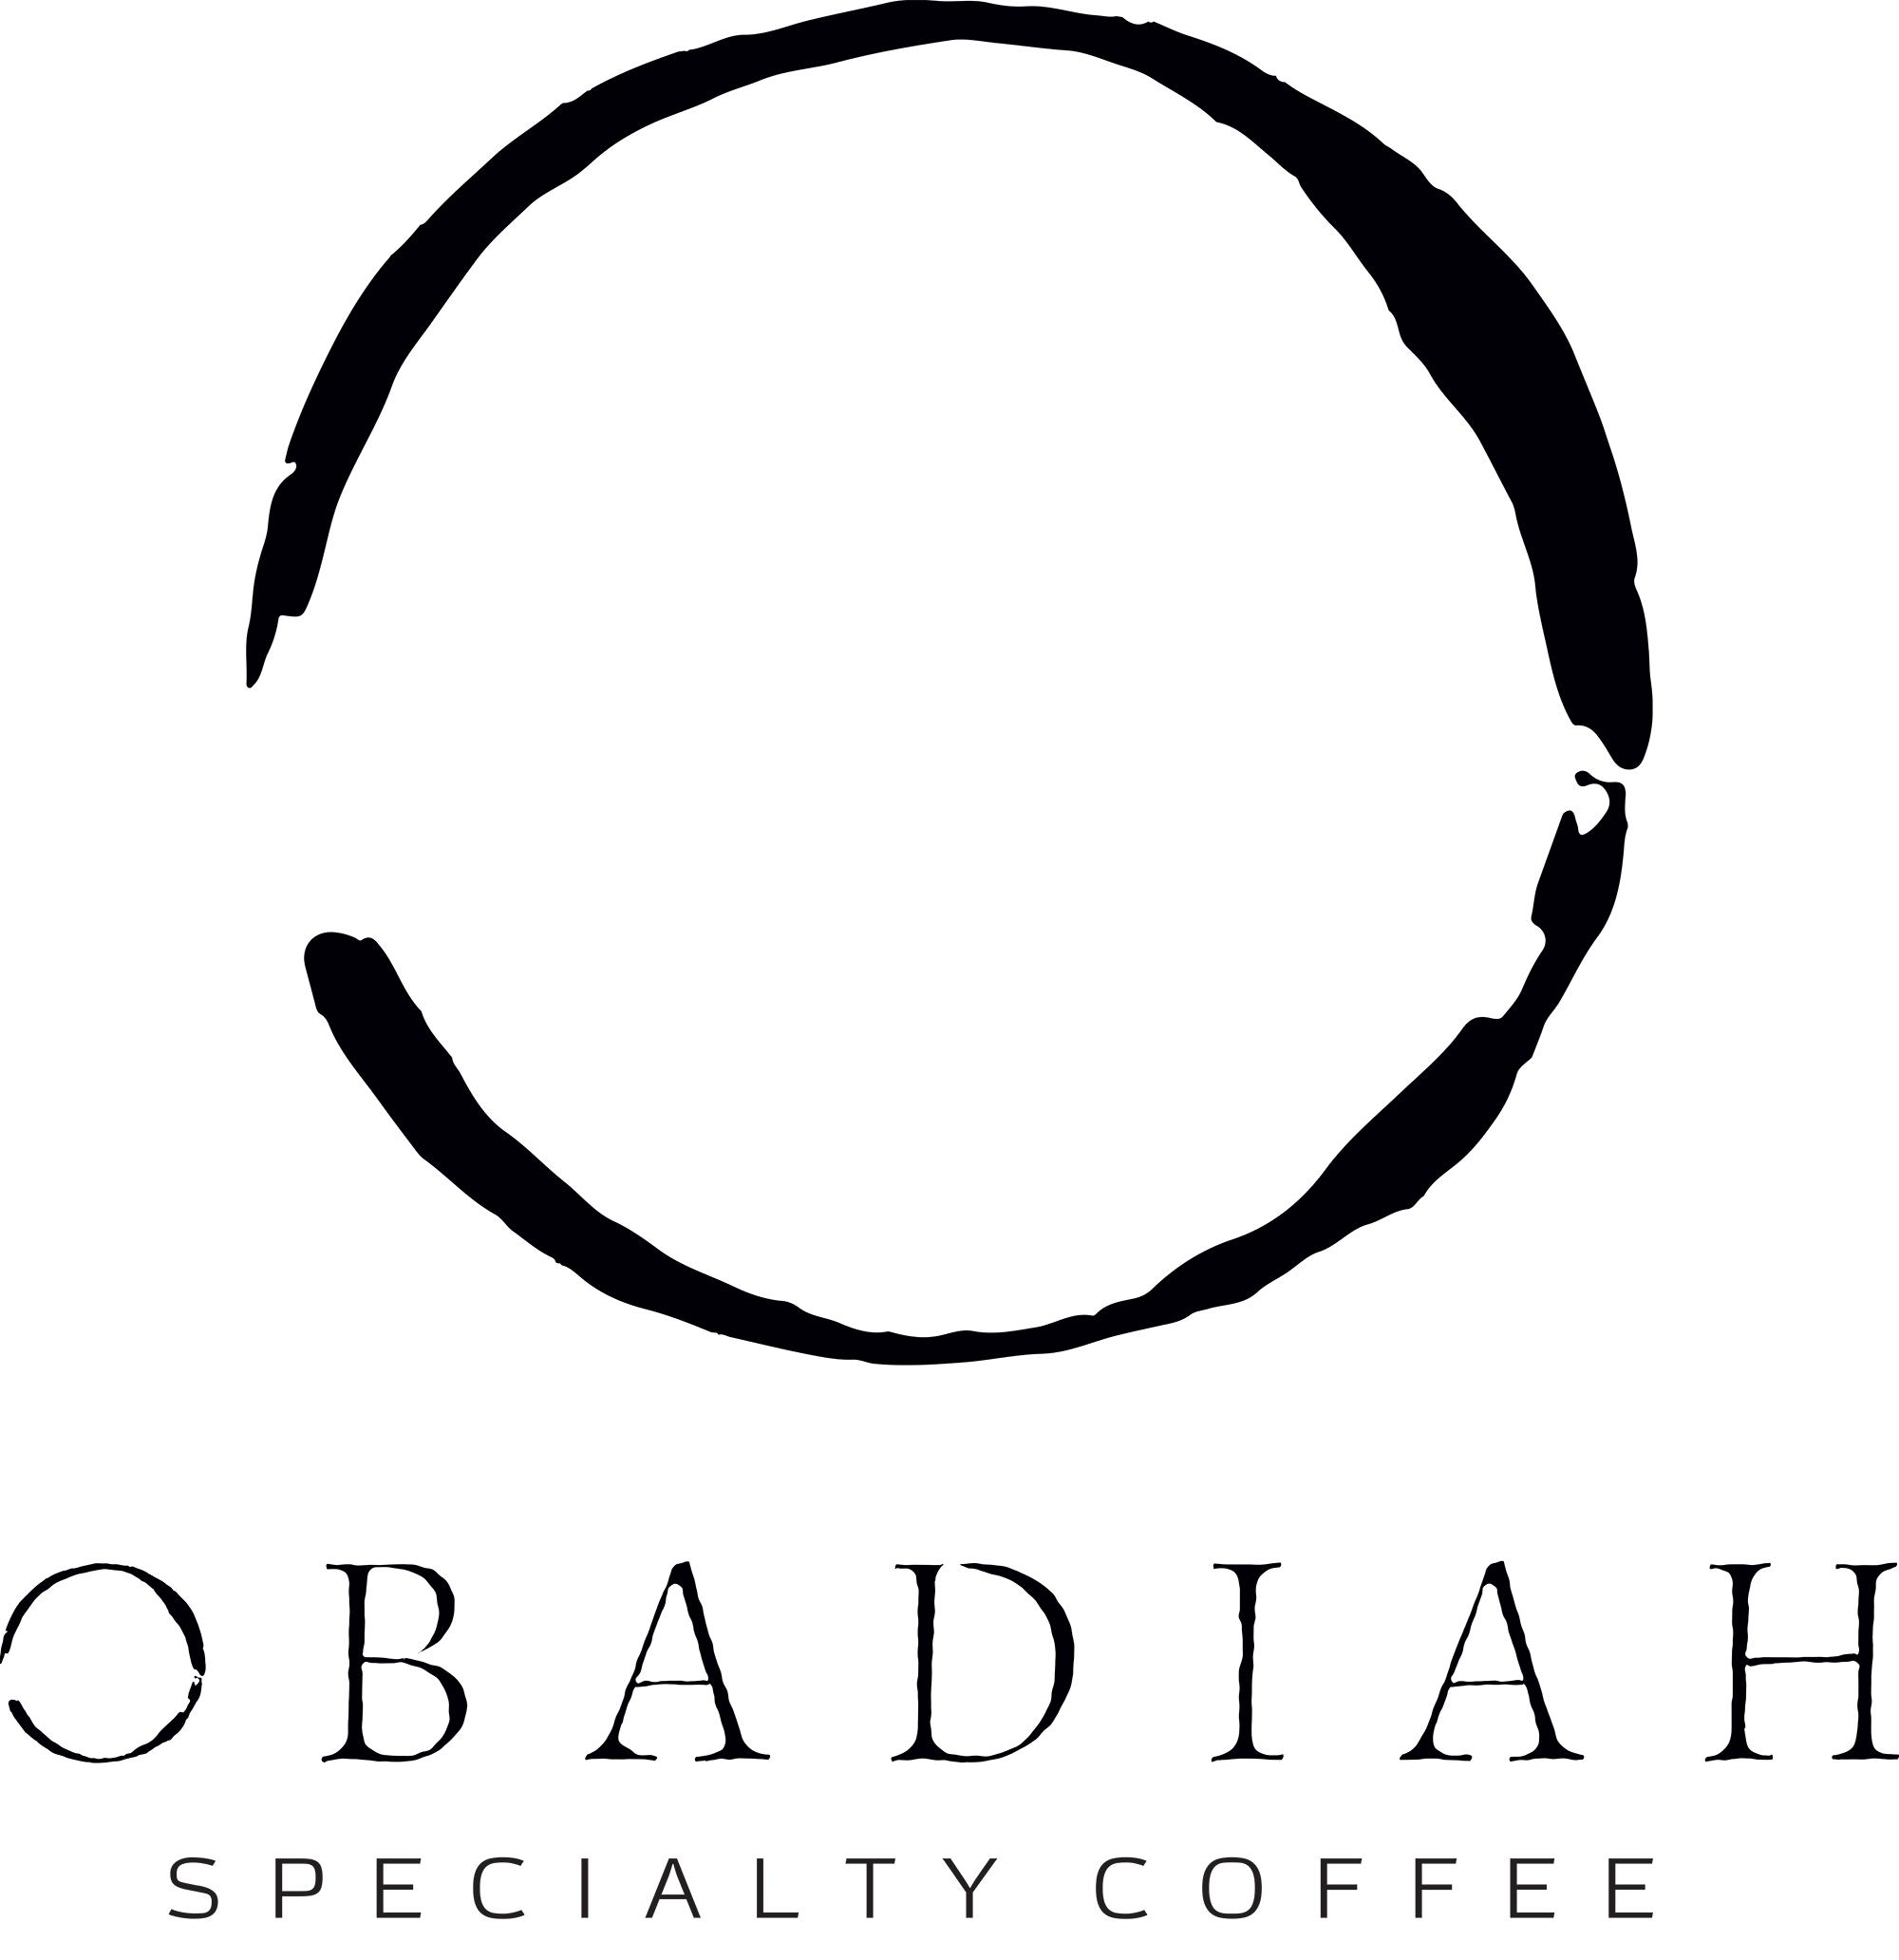 Obadiah